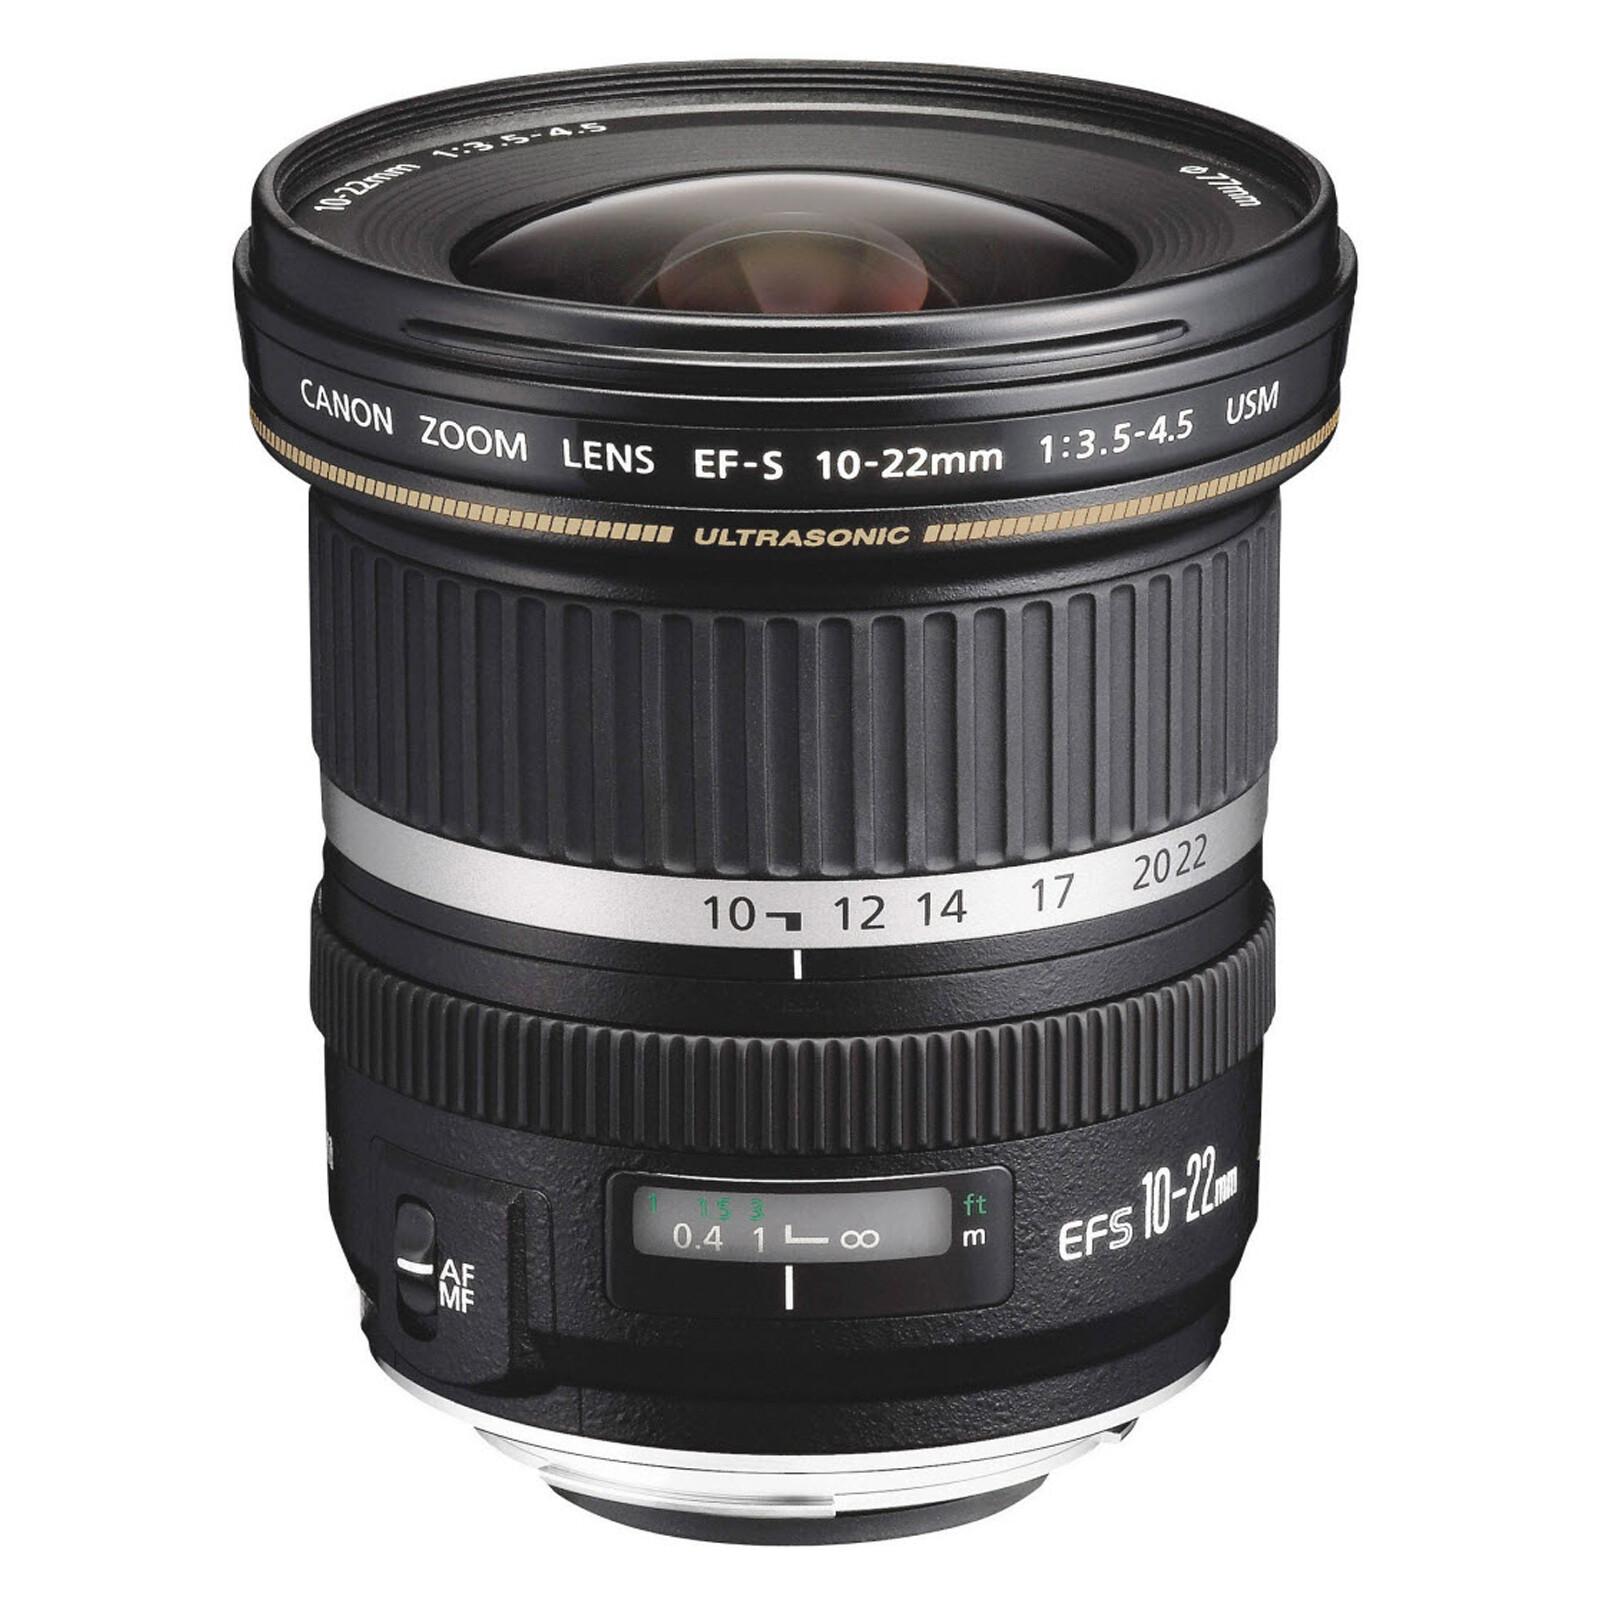 Canon EF-S 10-22/3,5-4,5 USM